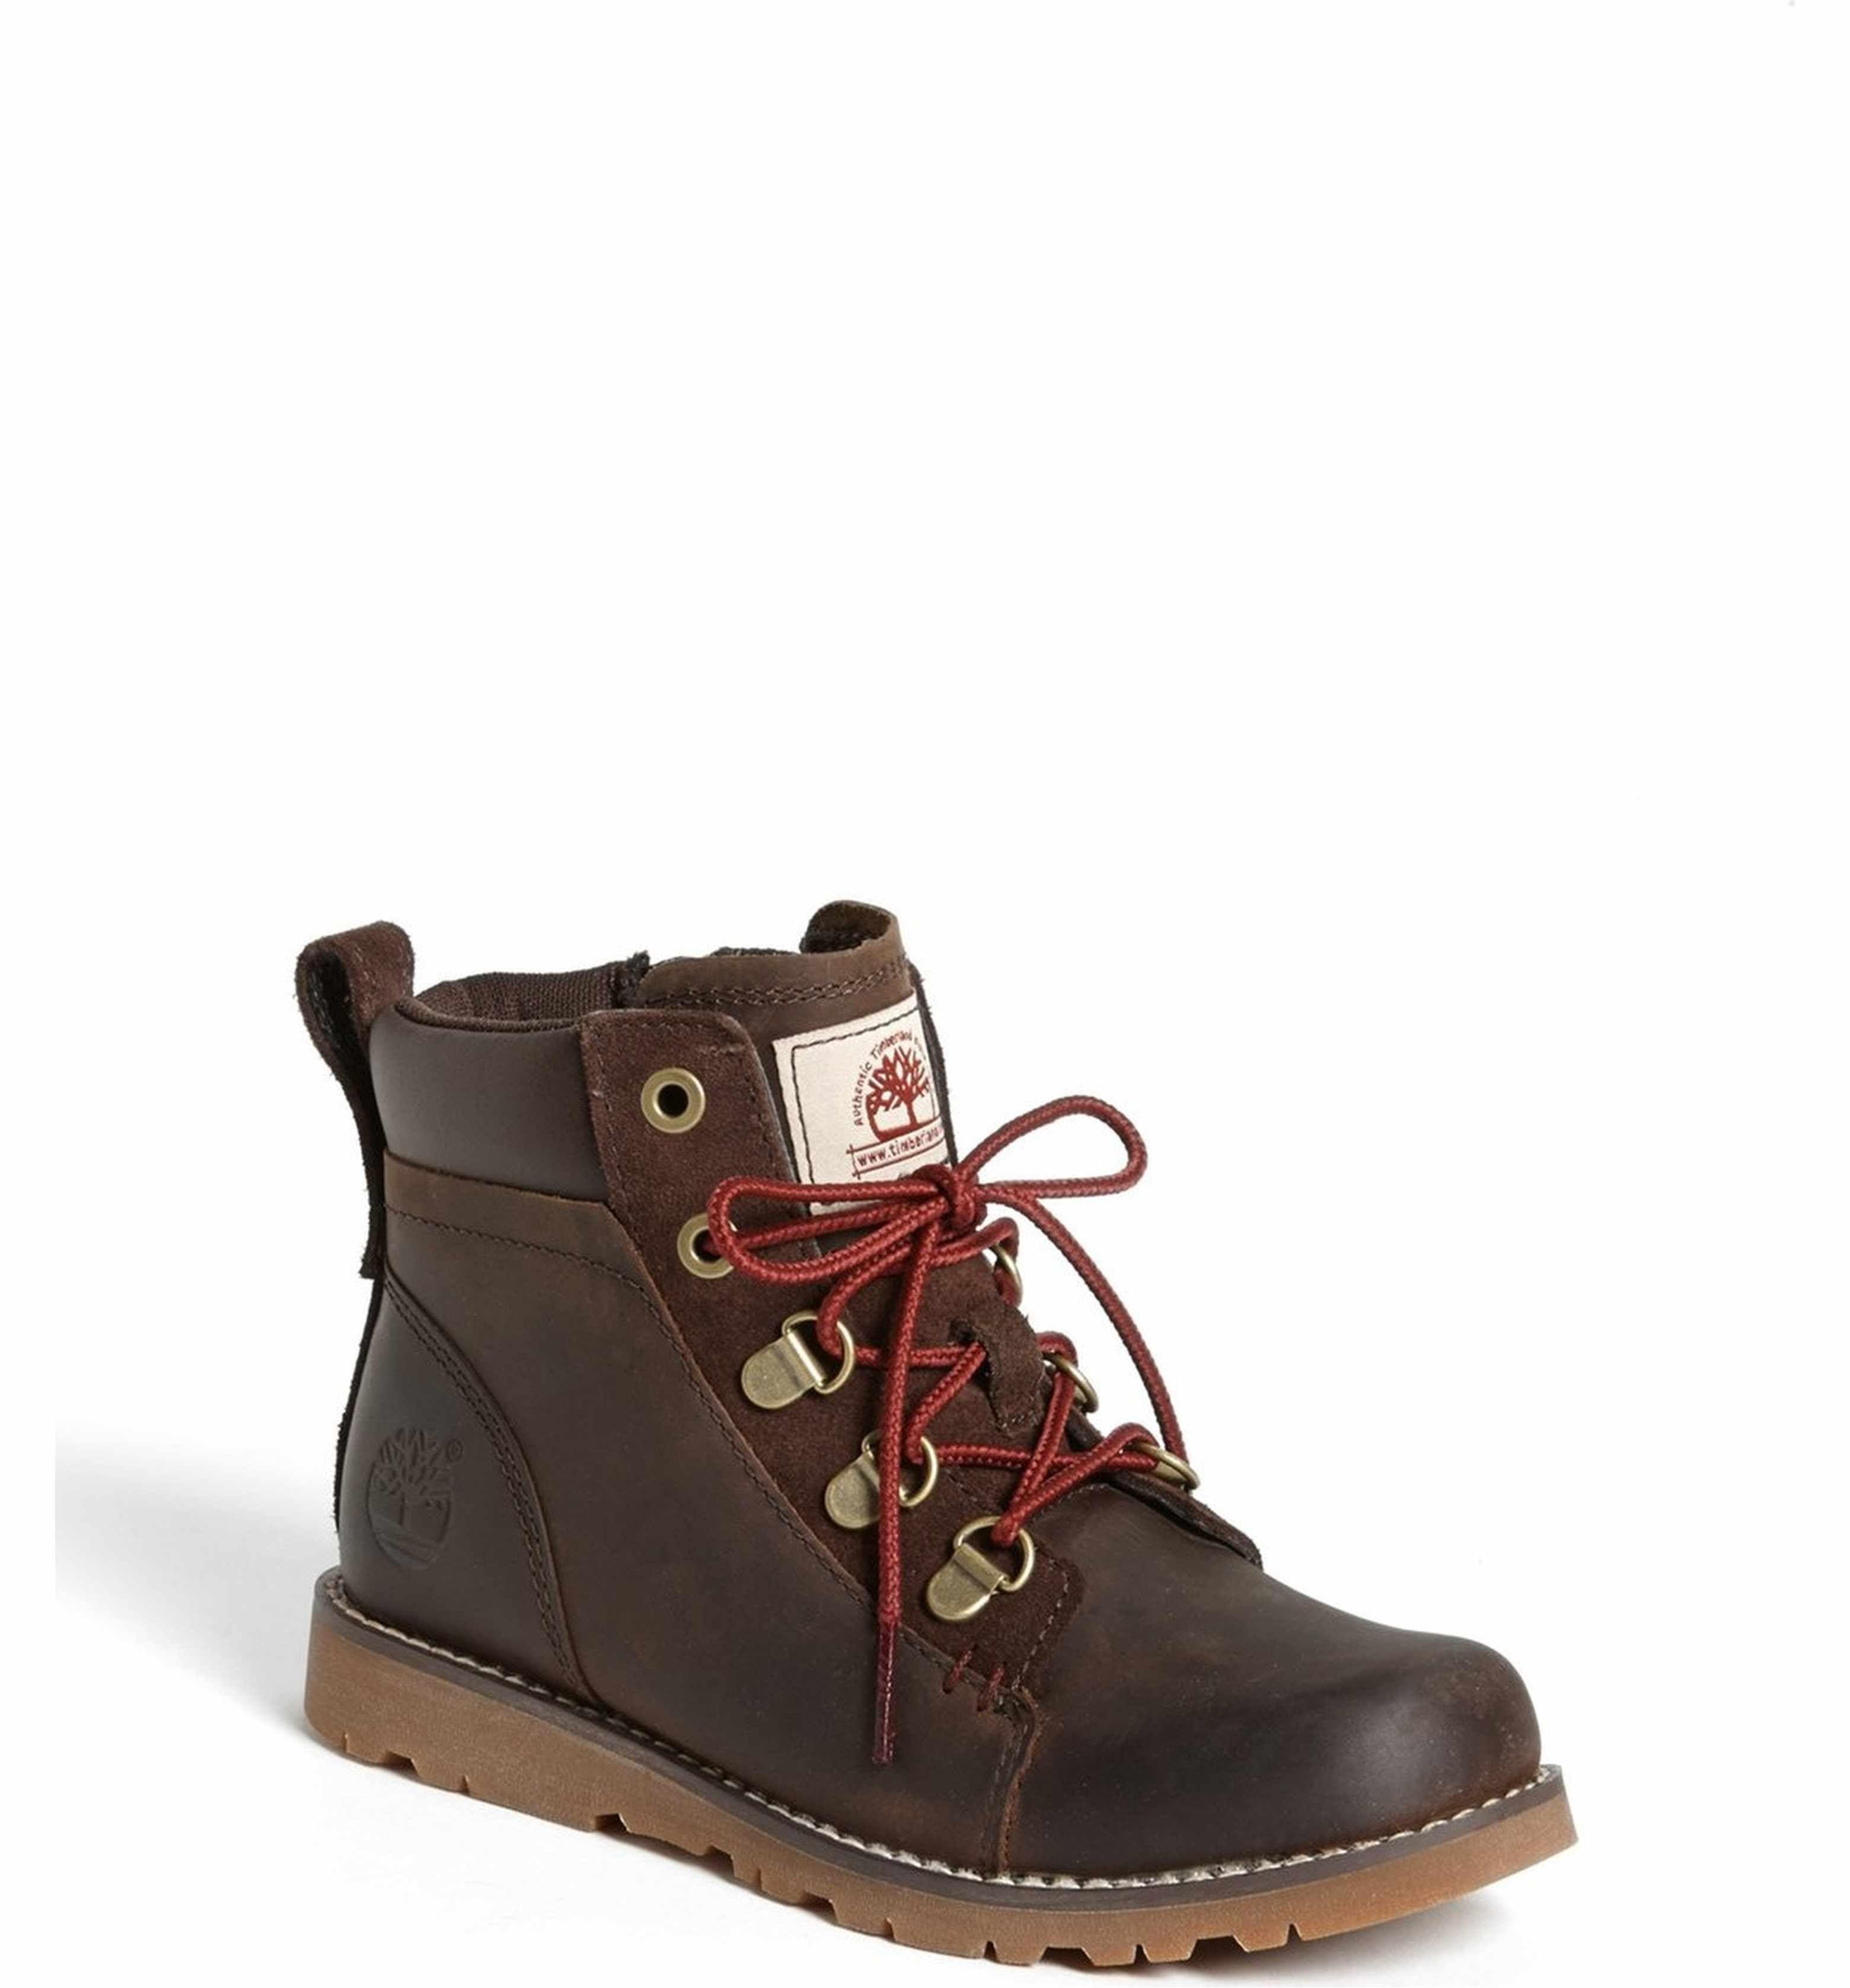 Boot (Toddler, Little Kid \u0026 Big Kid